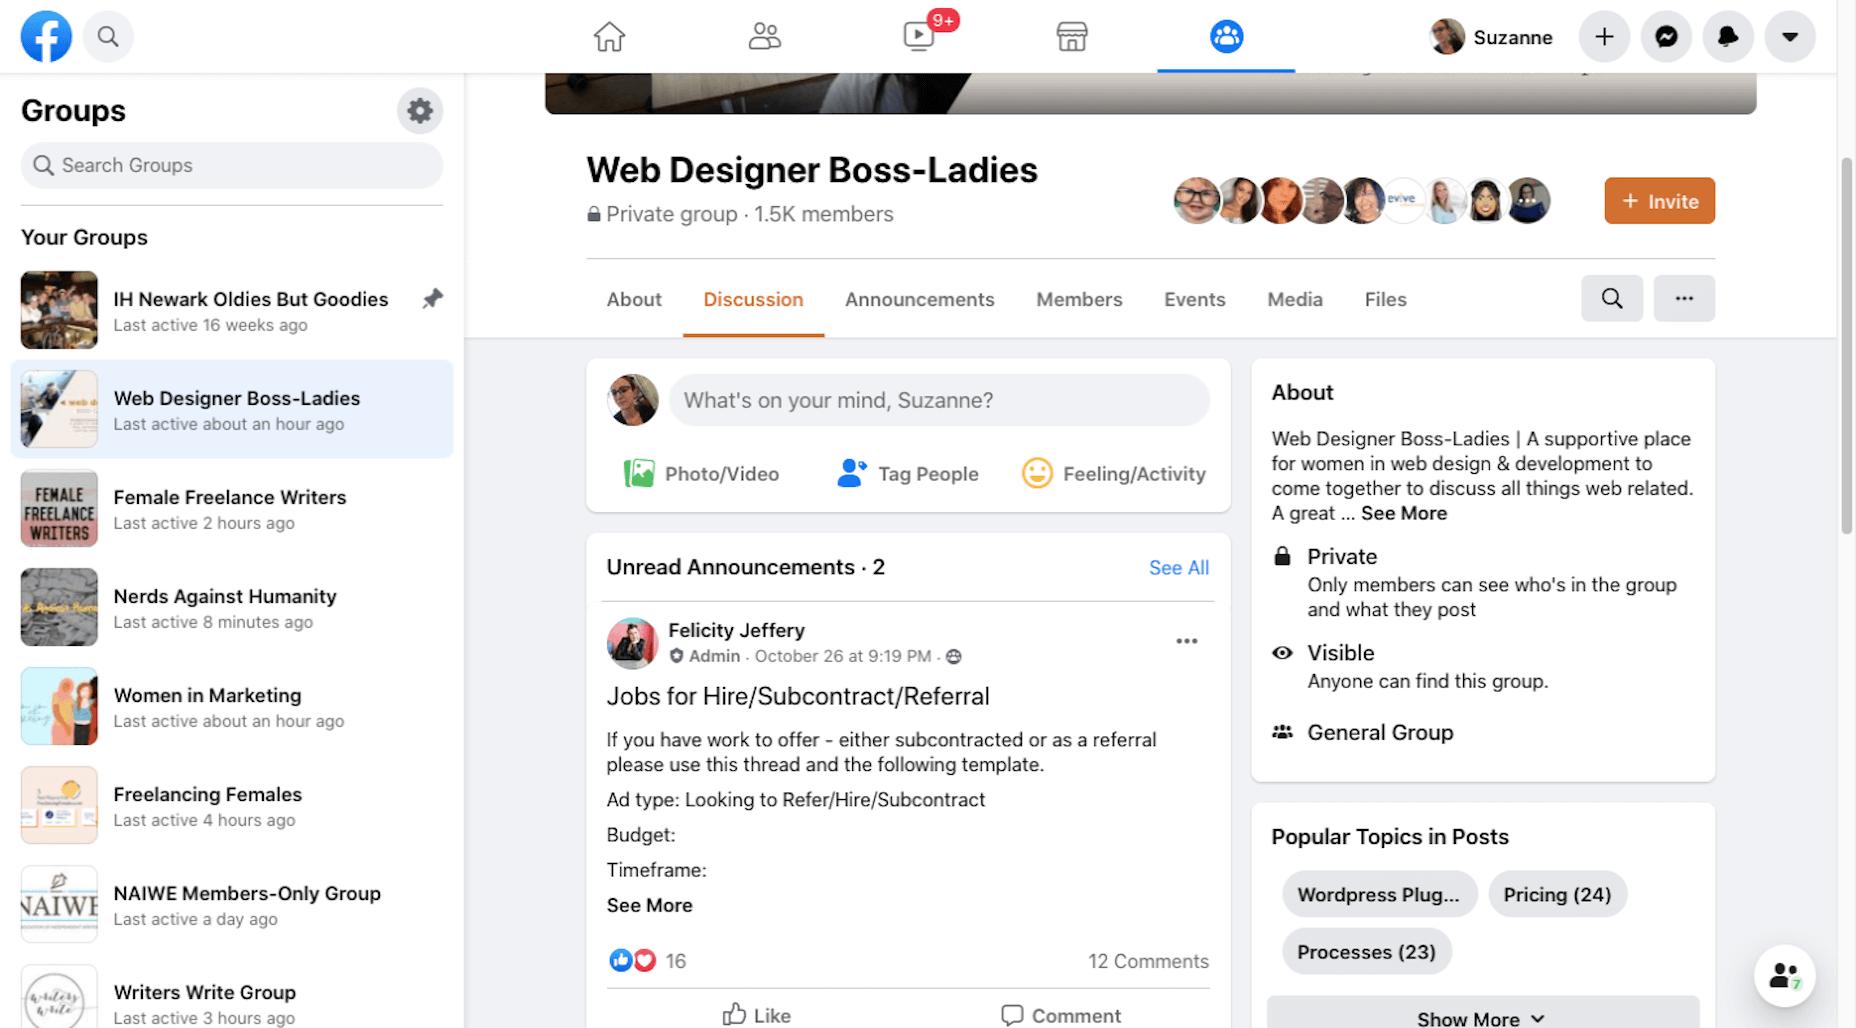 Facebook Group - Web Designer Boss-Ladies